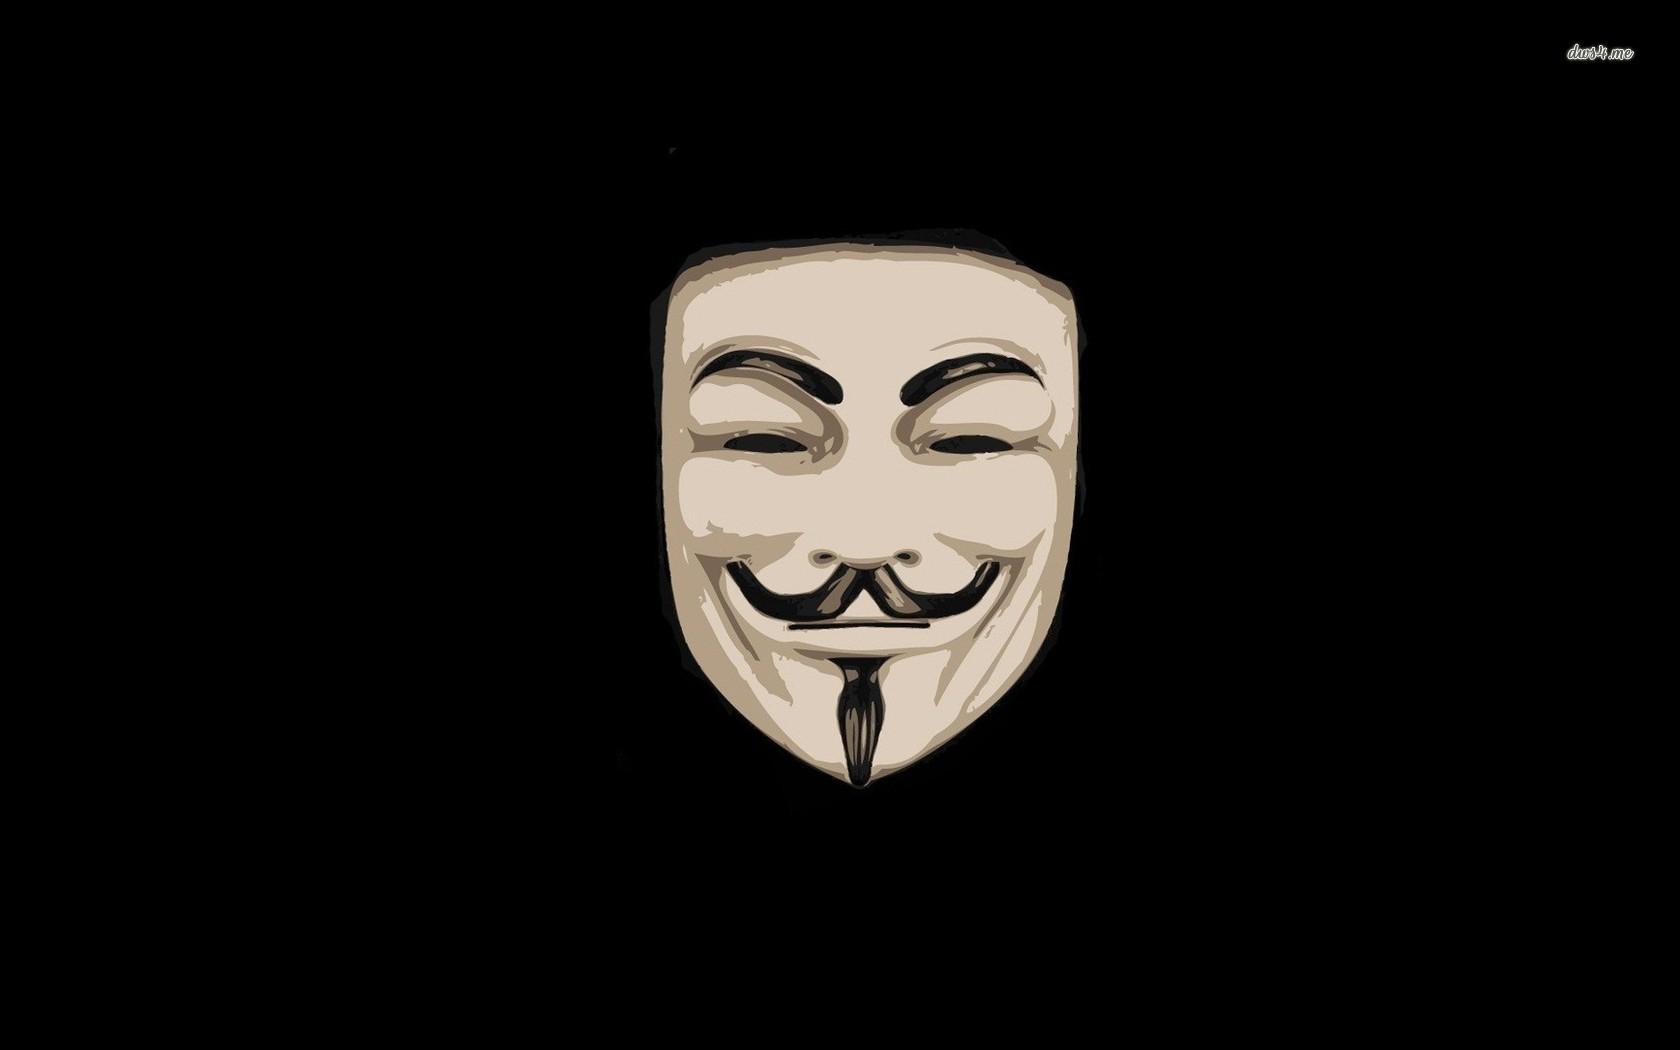 anonymous wallpaper 1280x800 - photo #3